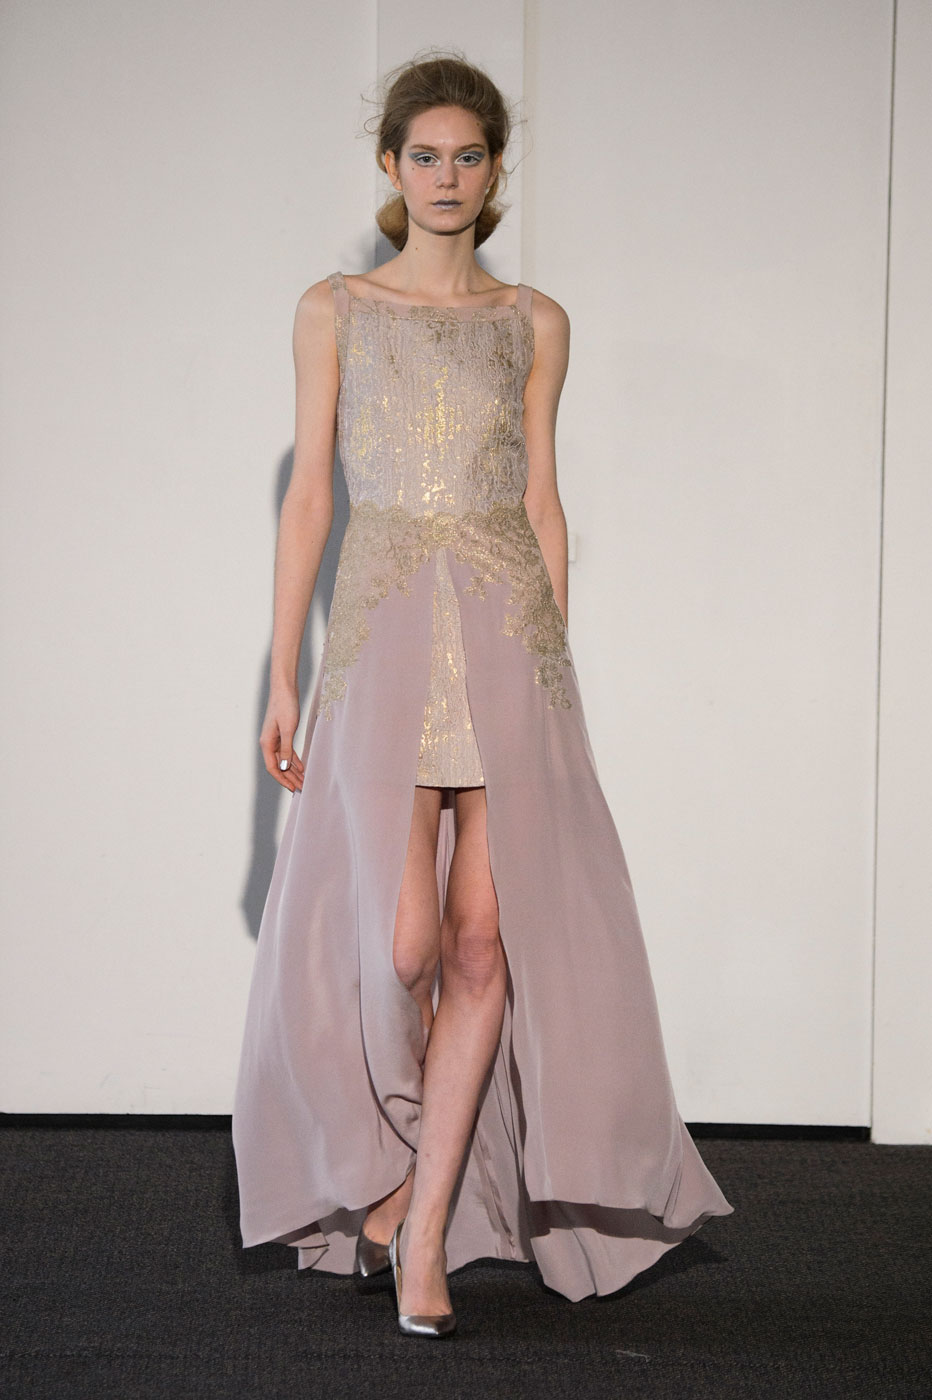 Busardi-fashion-runway-show-haute-couture-paris-spring-2015-the-impression-28